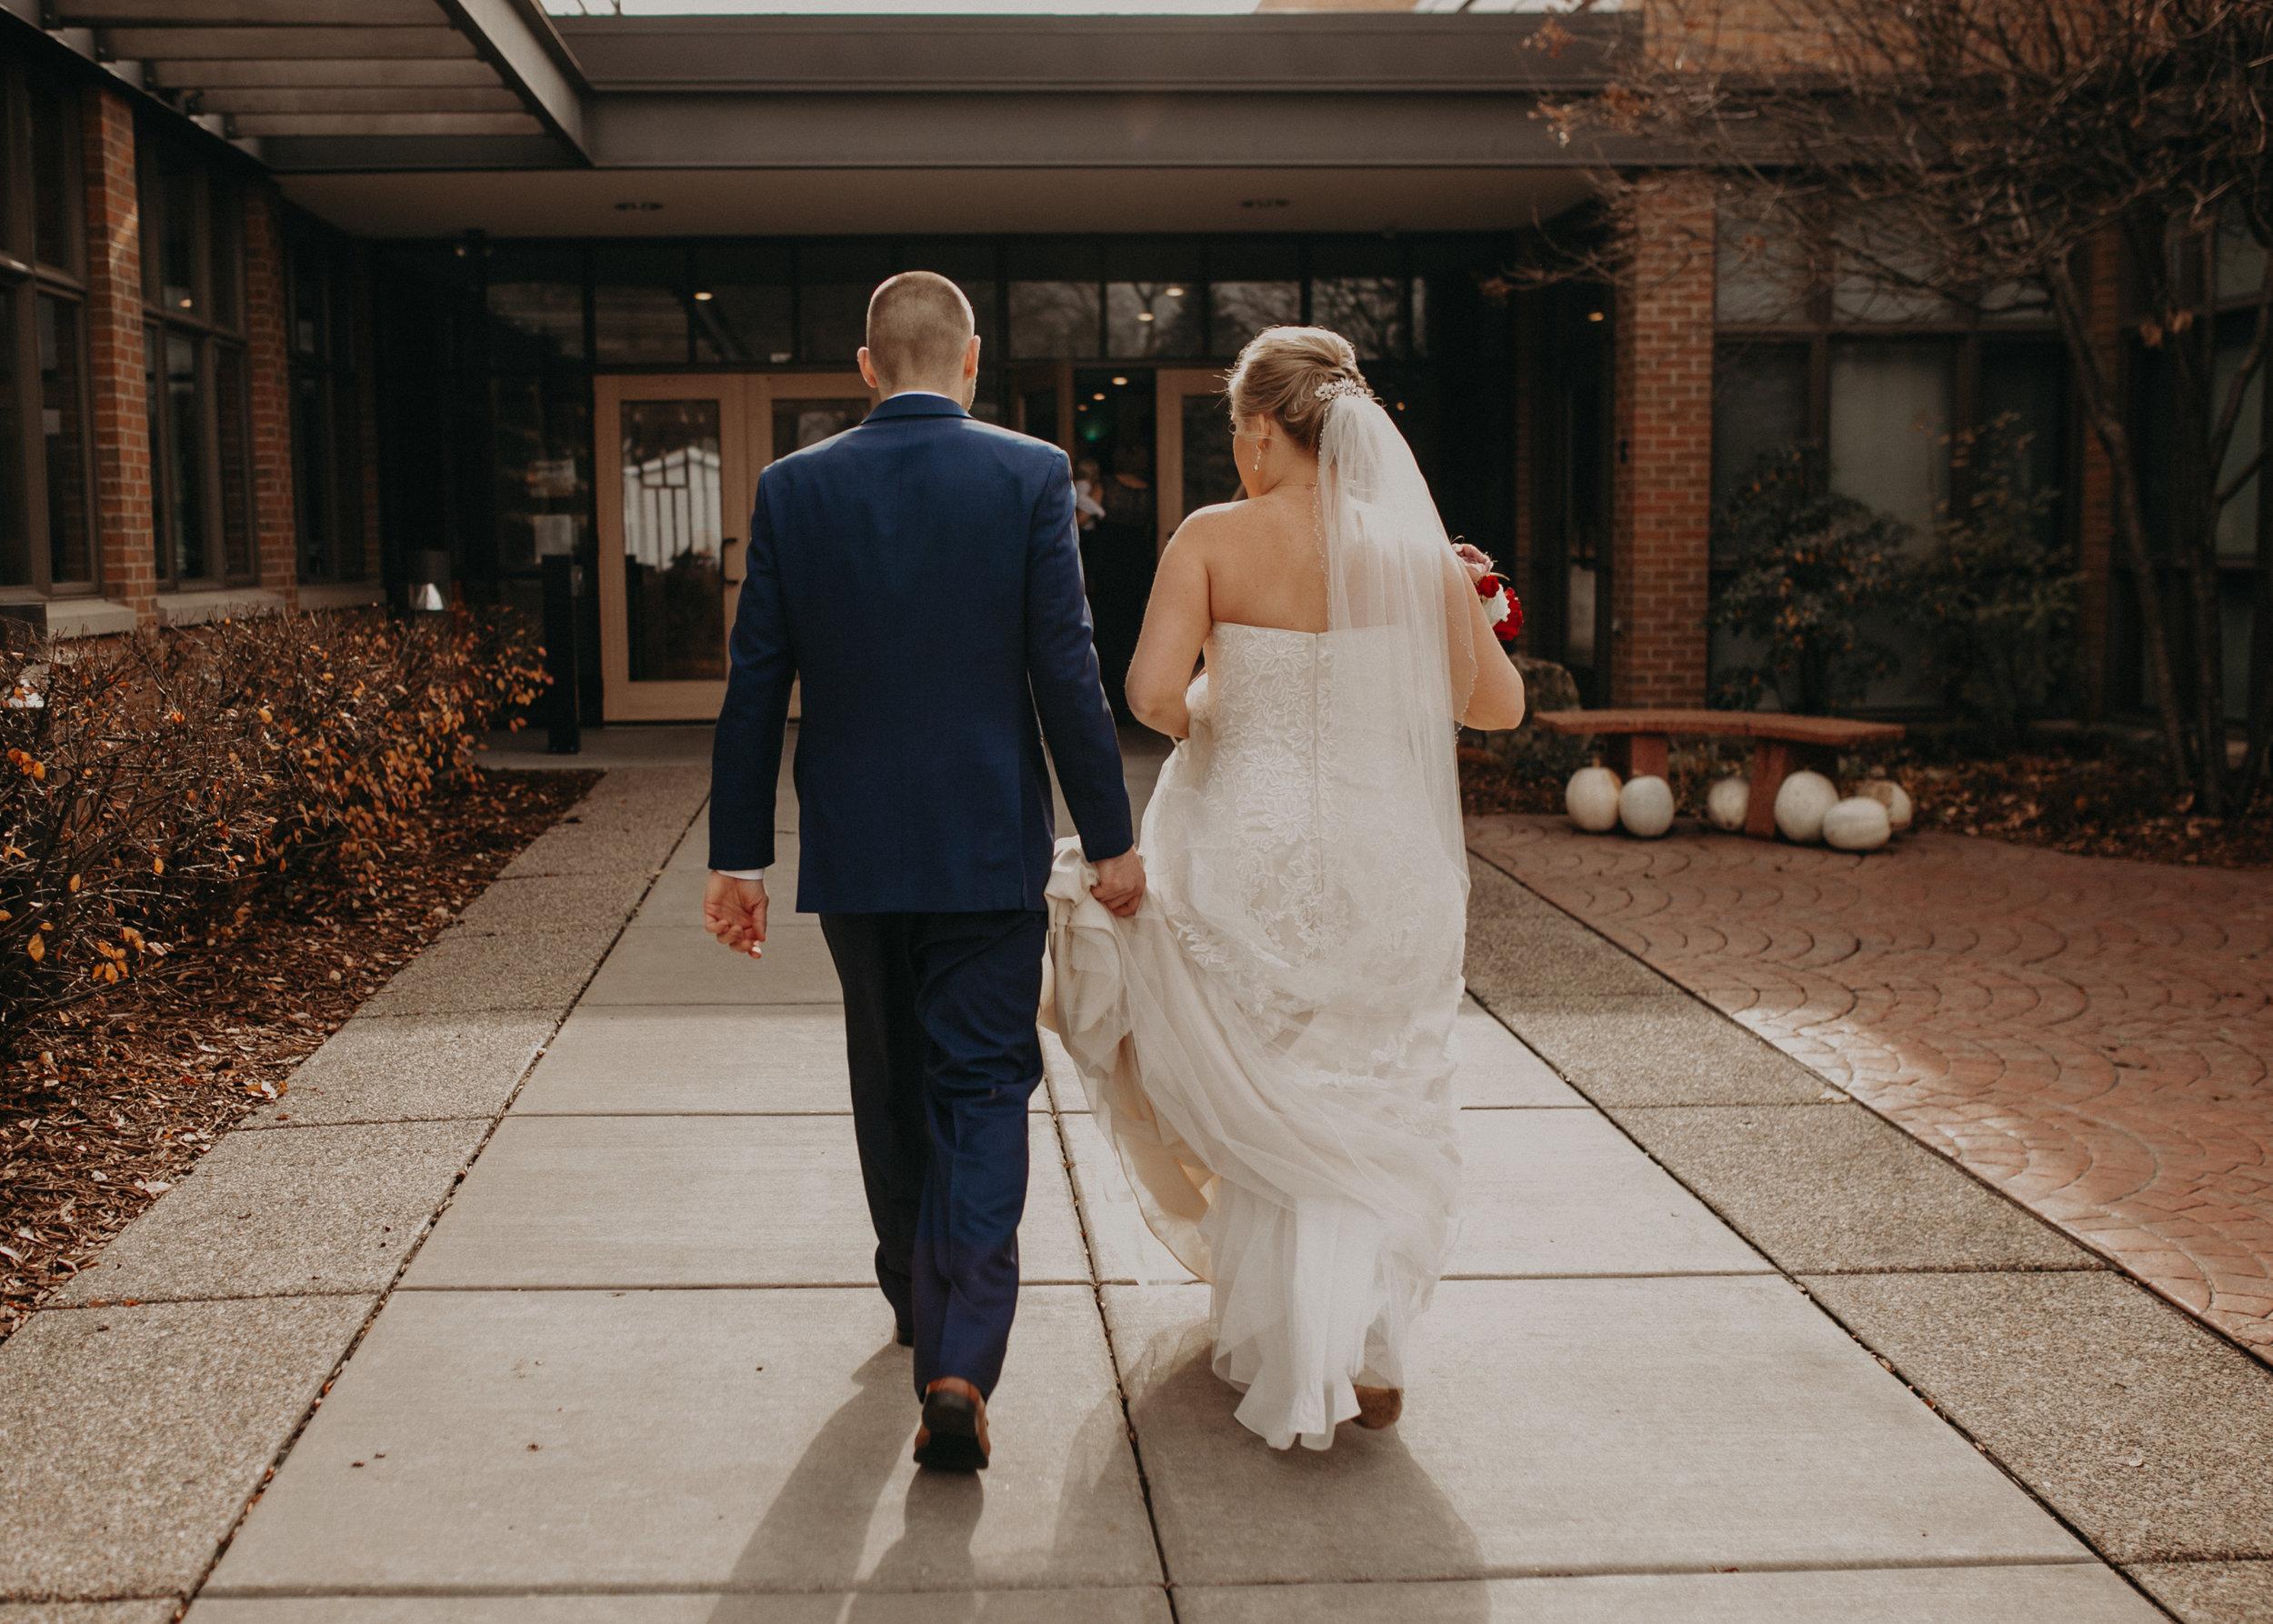 st-bridgets-church-first-look-bride-groom